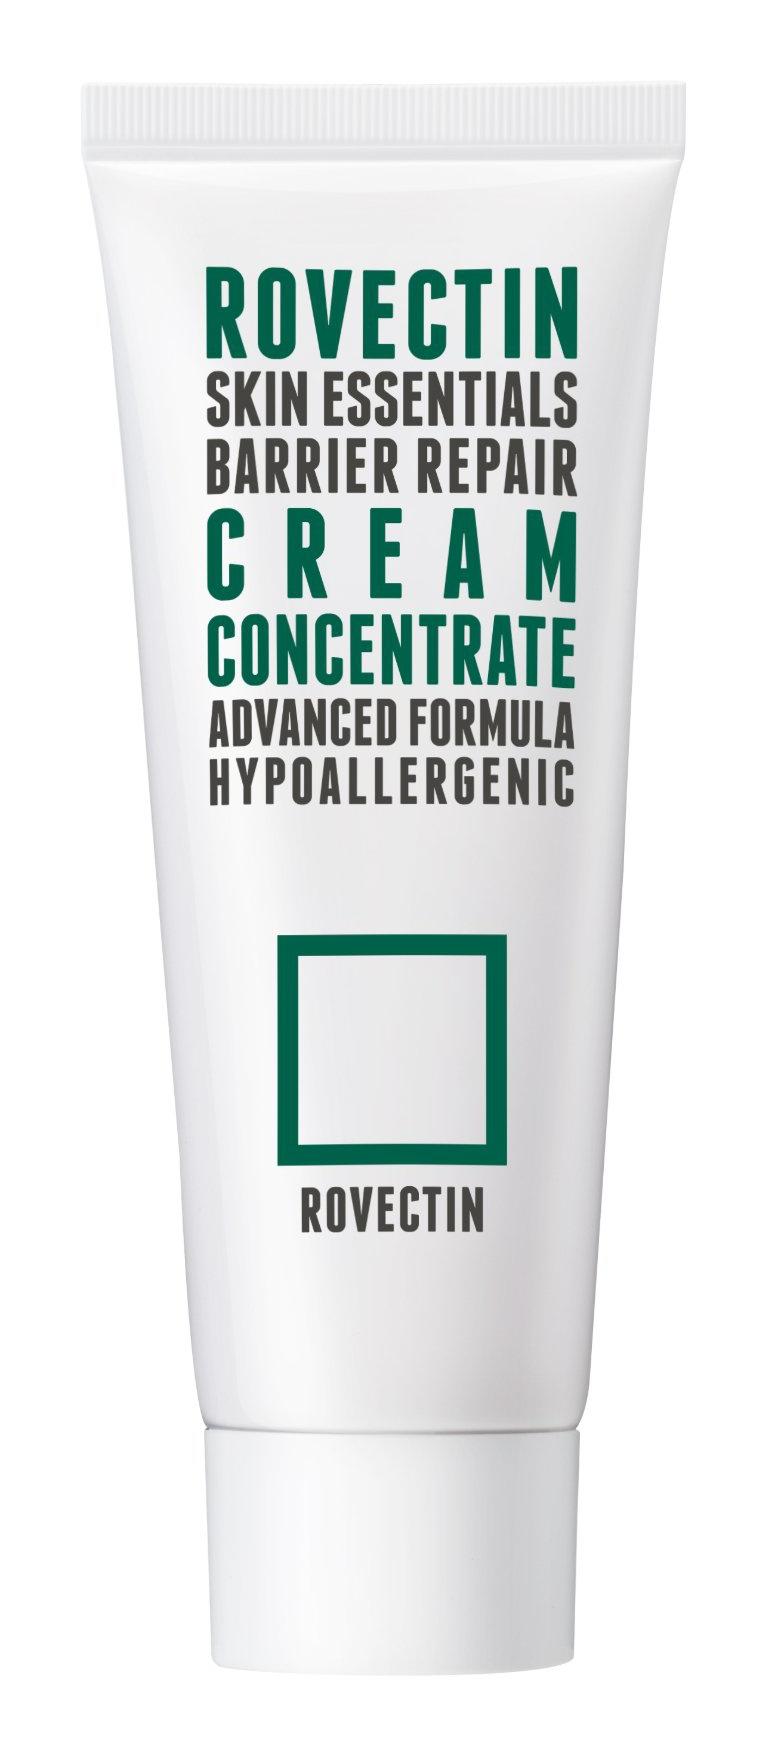 rovectin Skin Essentials Barrier Repair Cream Concentrate